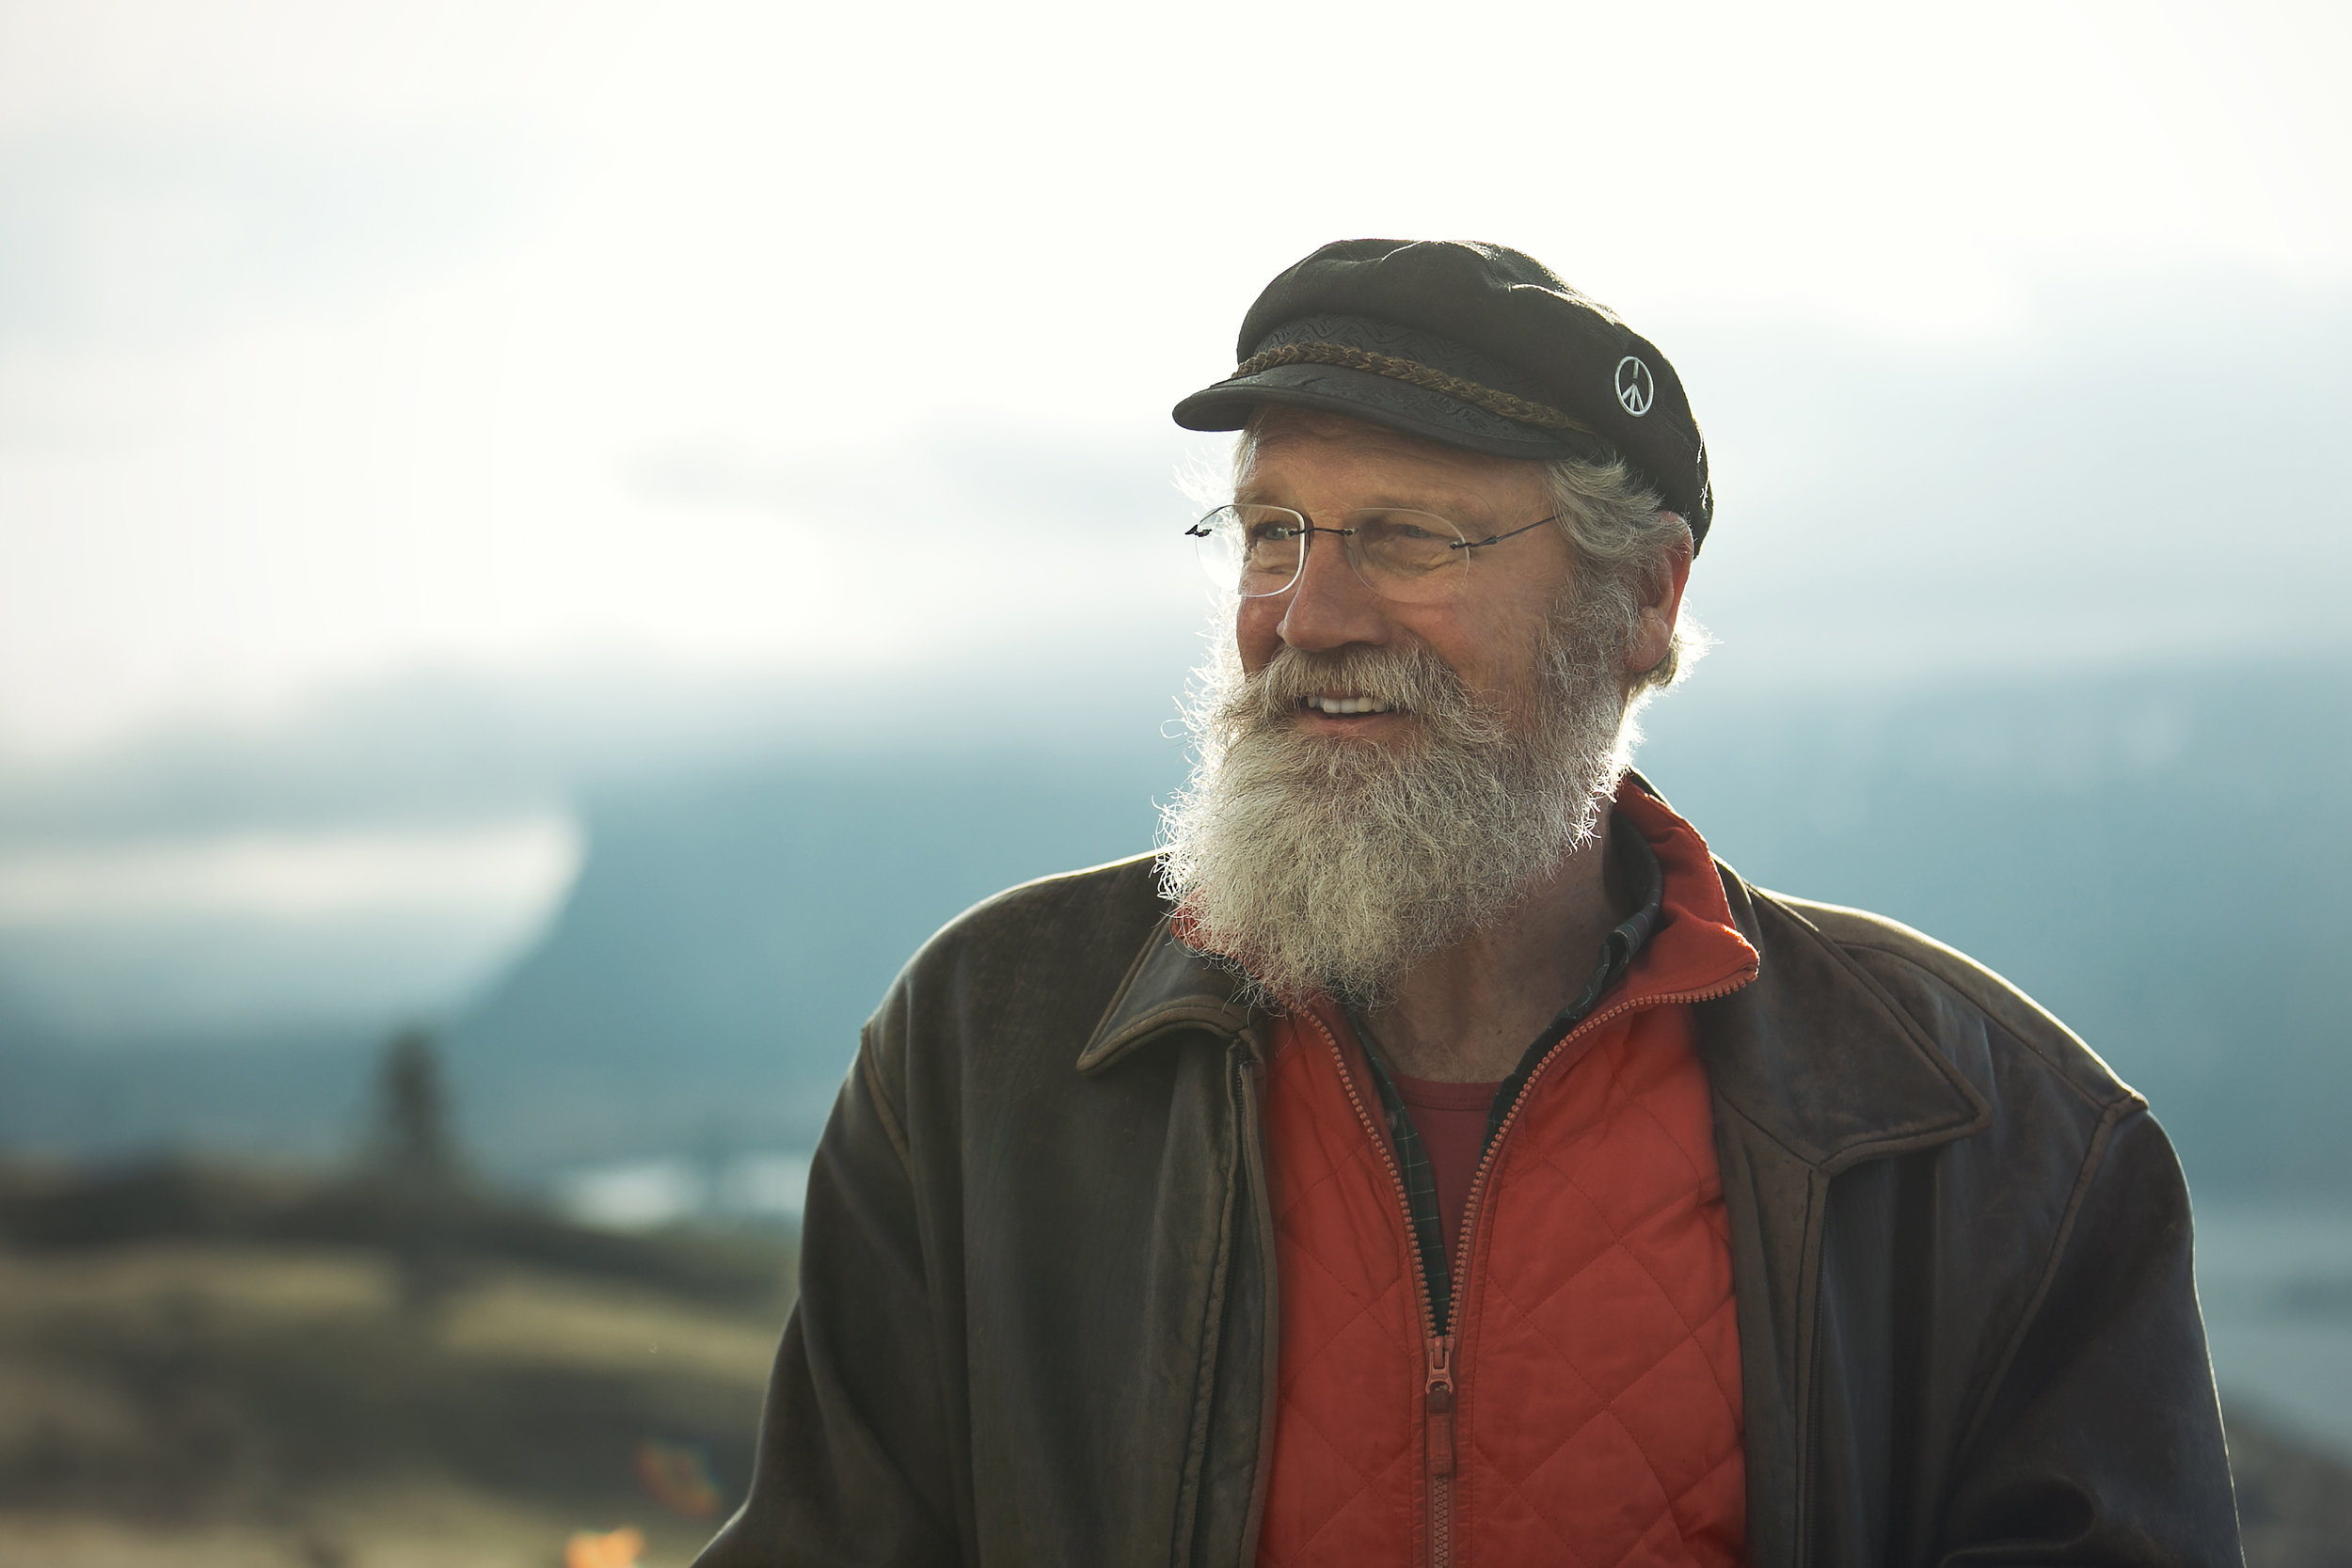 Don Gayton - author and Grasslands Ecologist